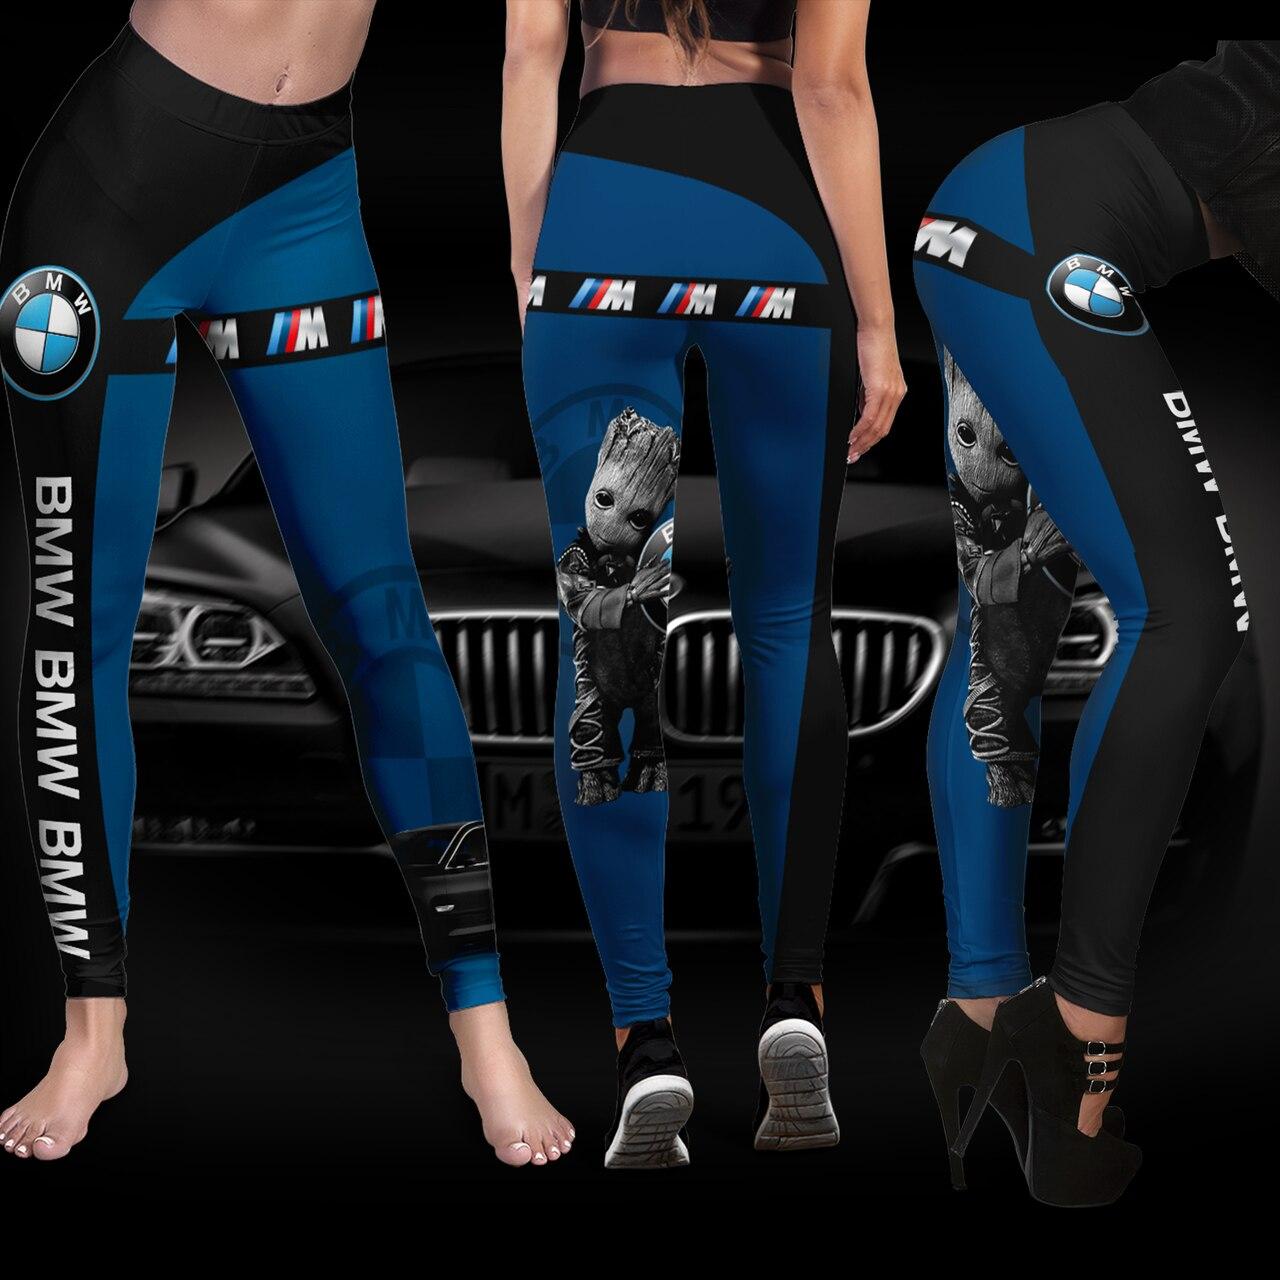 Baby groot hold bmw logo full printing legging